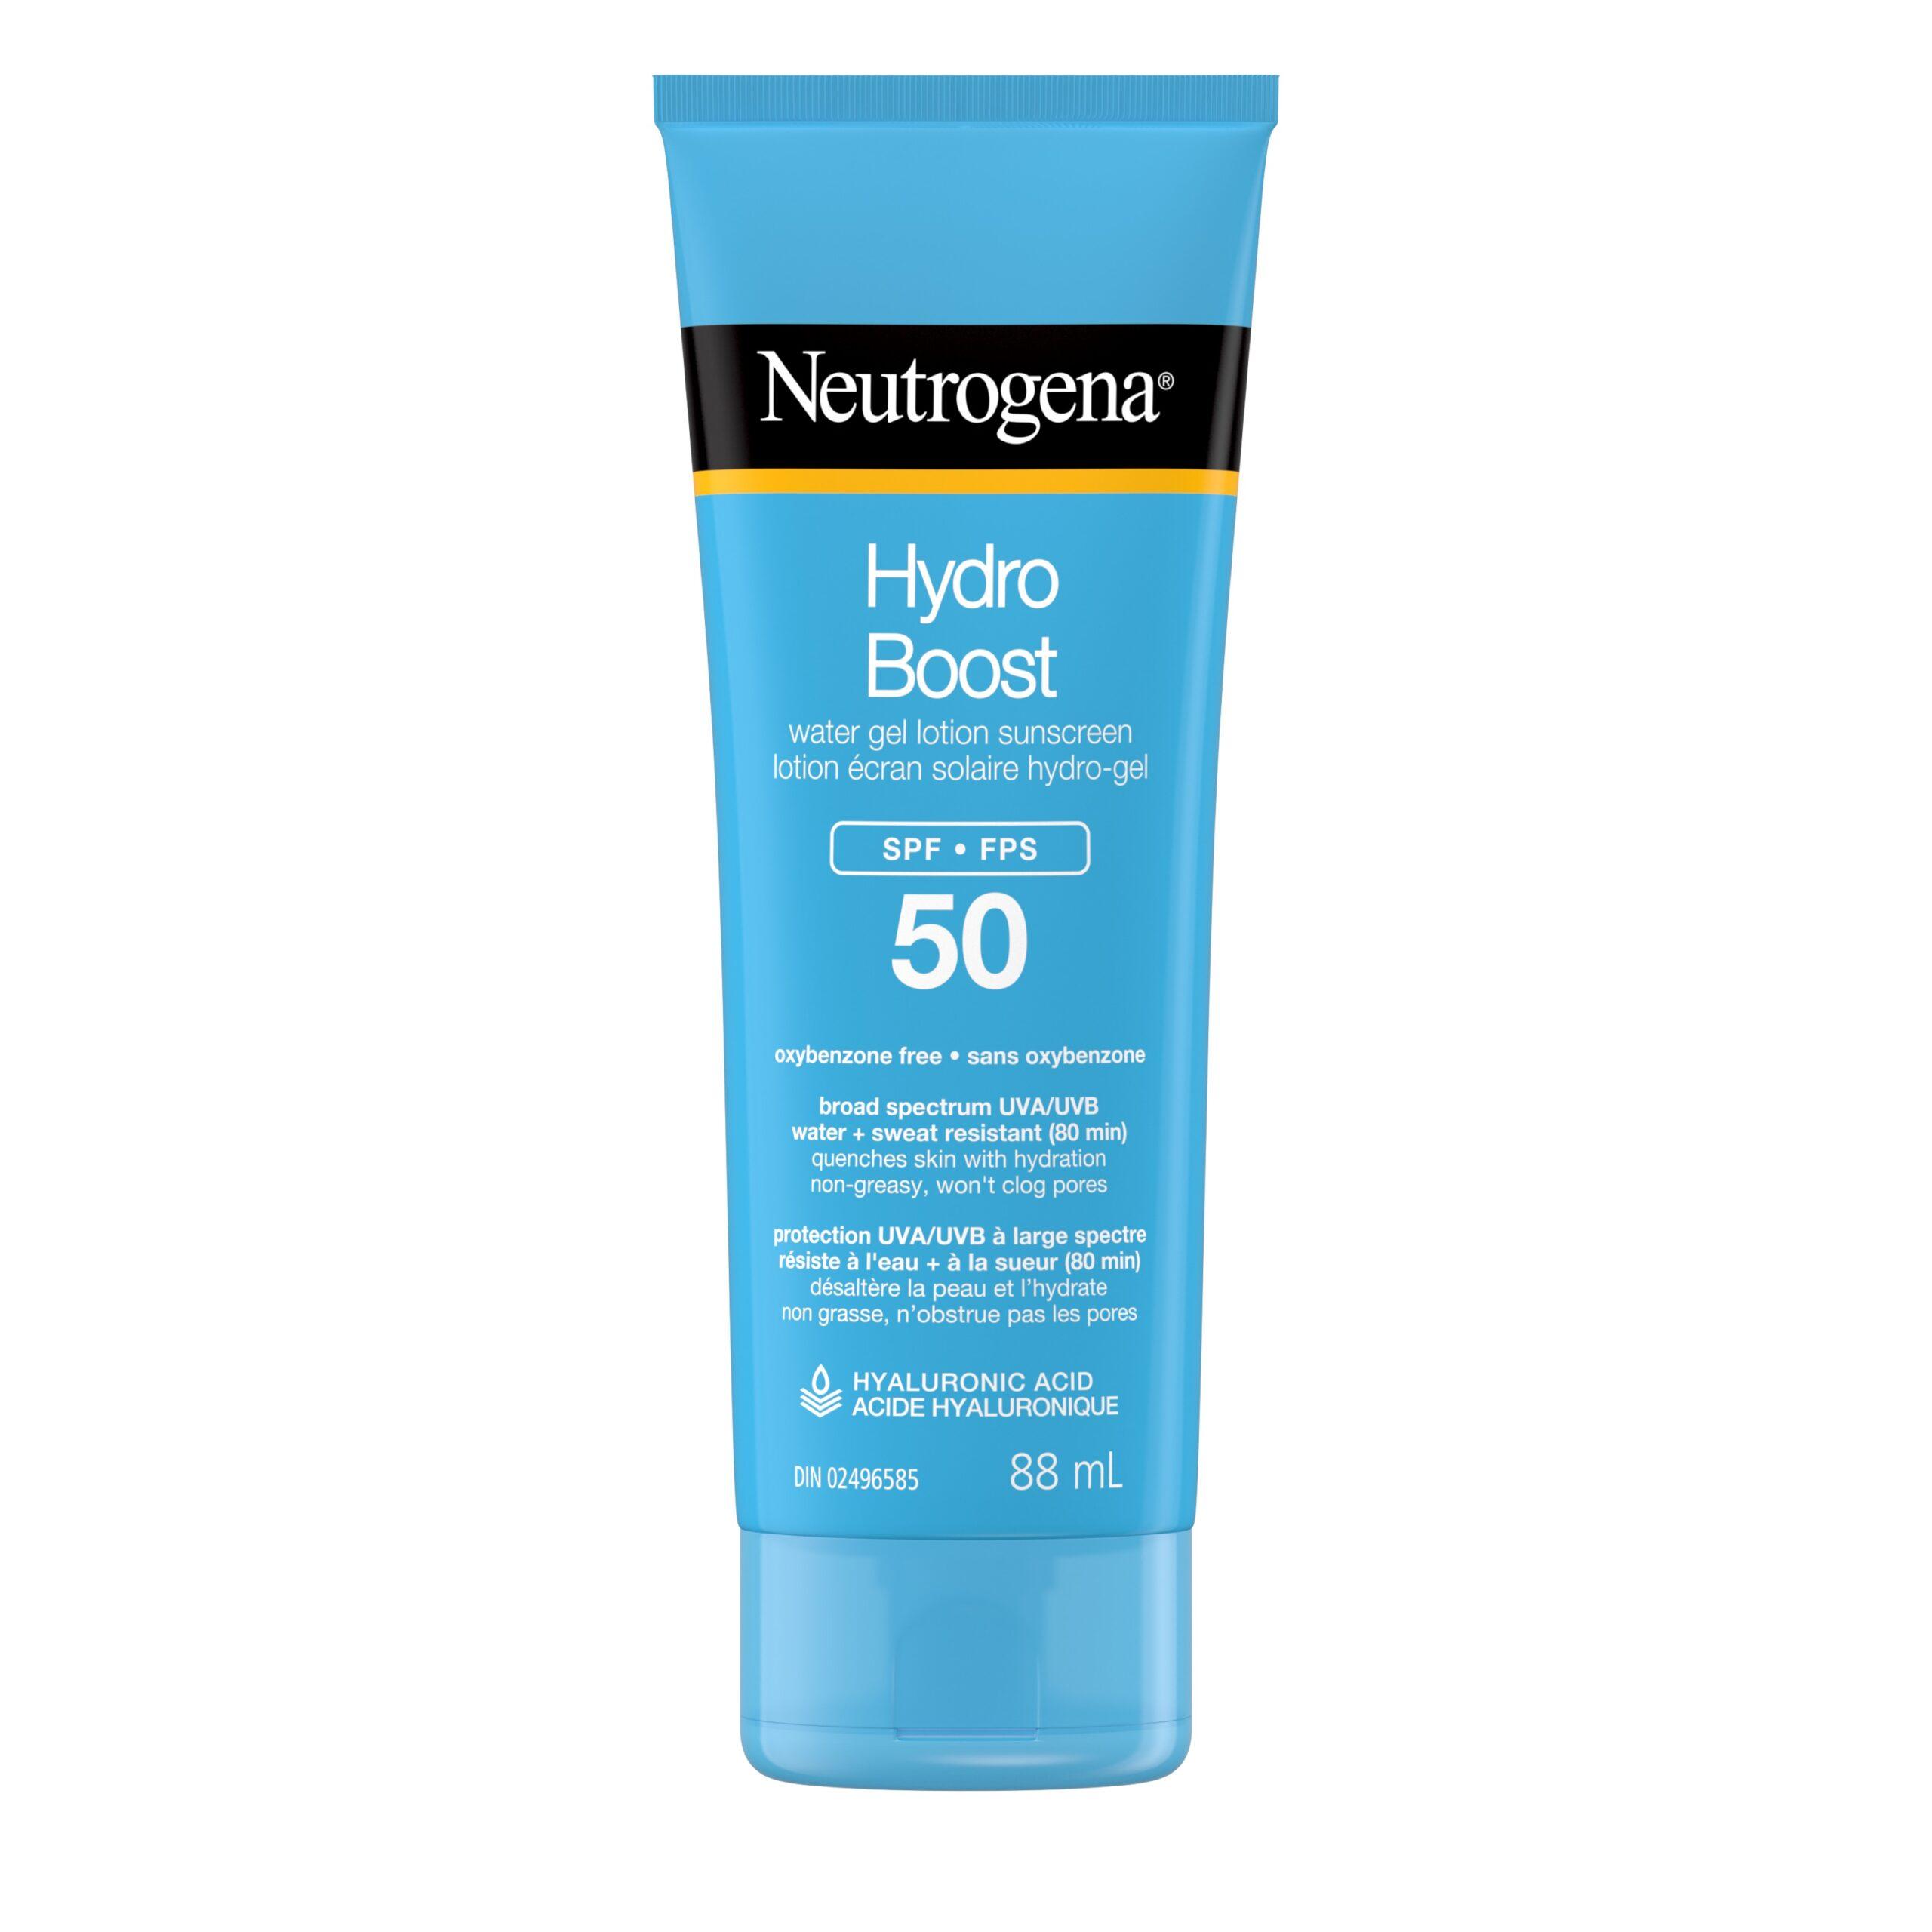 Neutrogena Hydro Boost Water Gel Sunscreen - $15.97 - $18.99 CAD